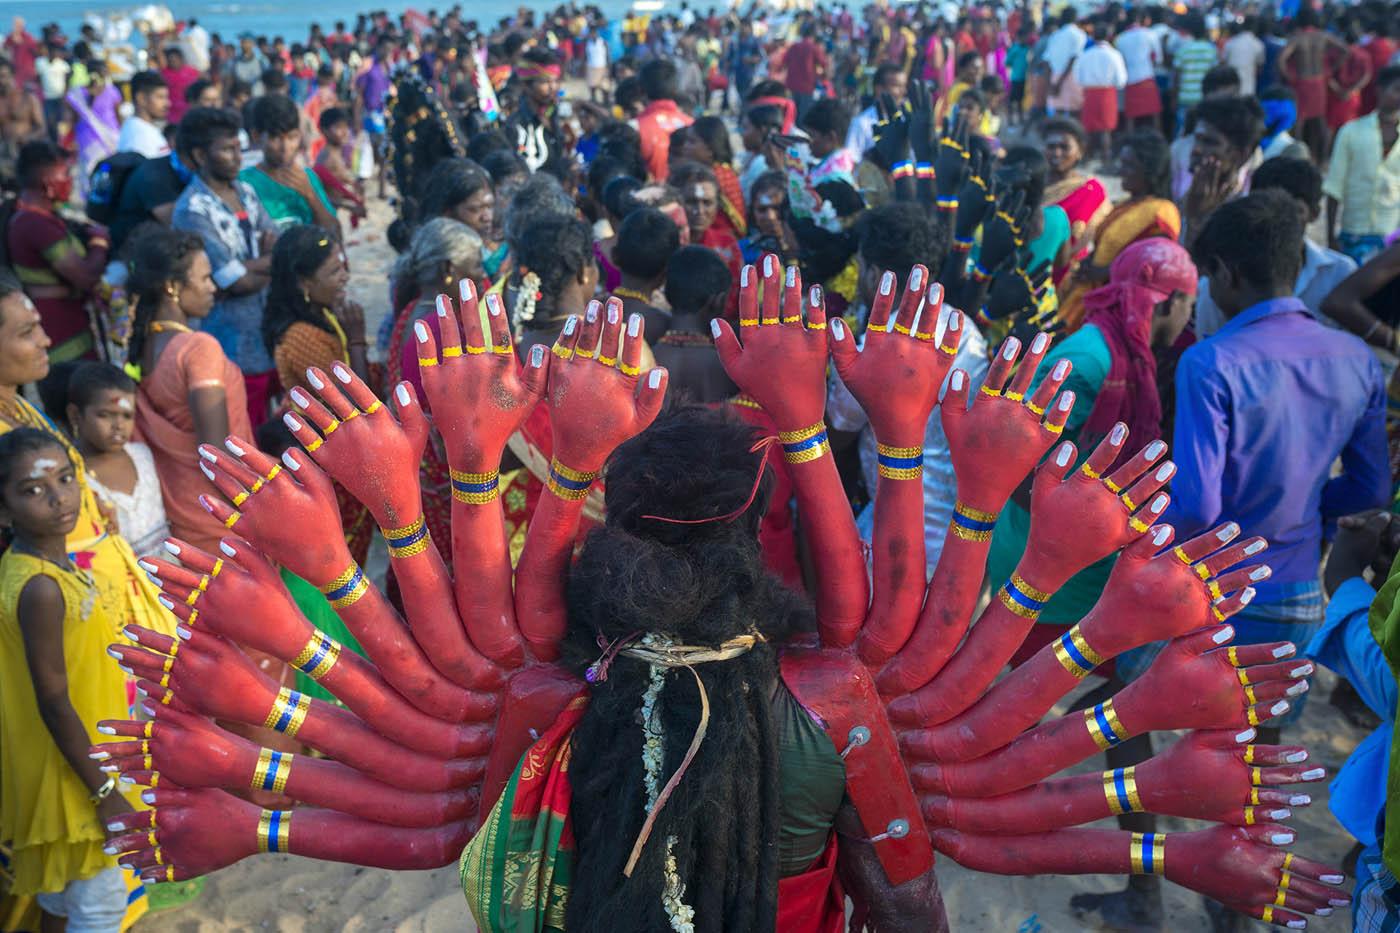 travel photography indian kulasai dhasara by saravanan dhandapani